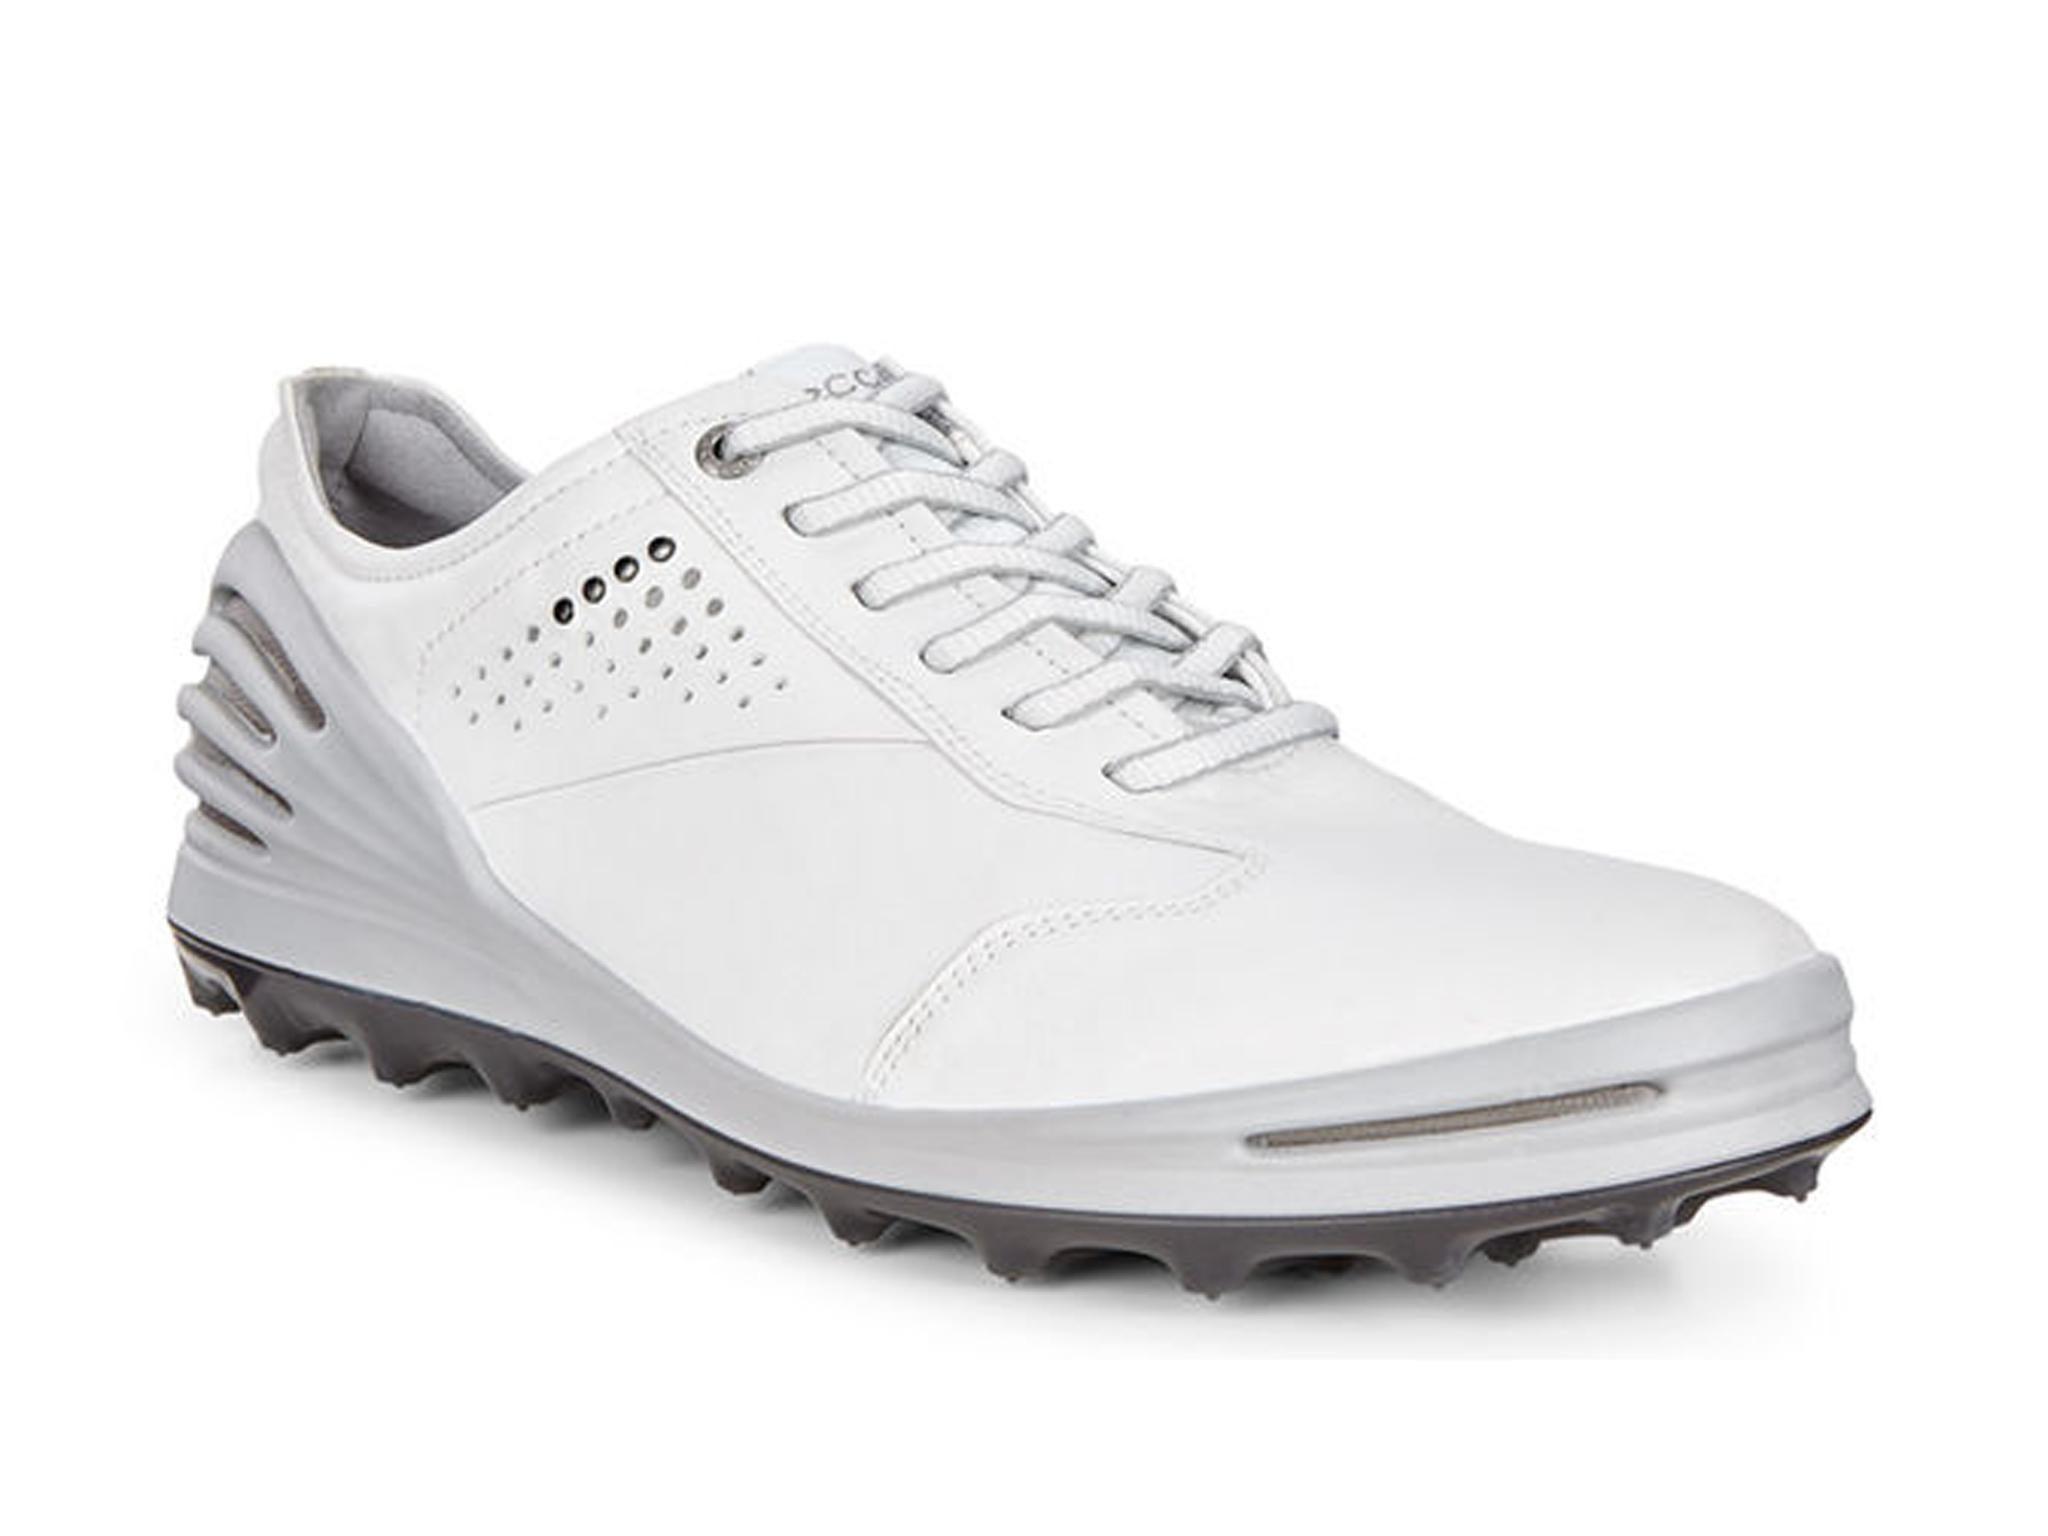 adidas summer golf shoes